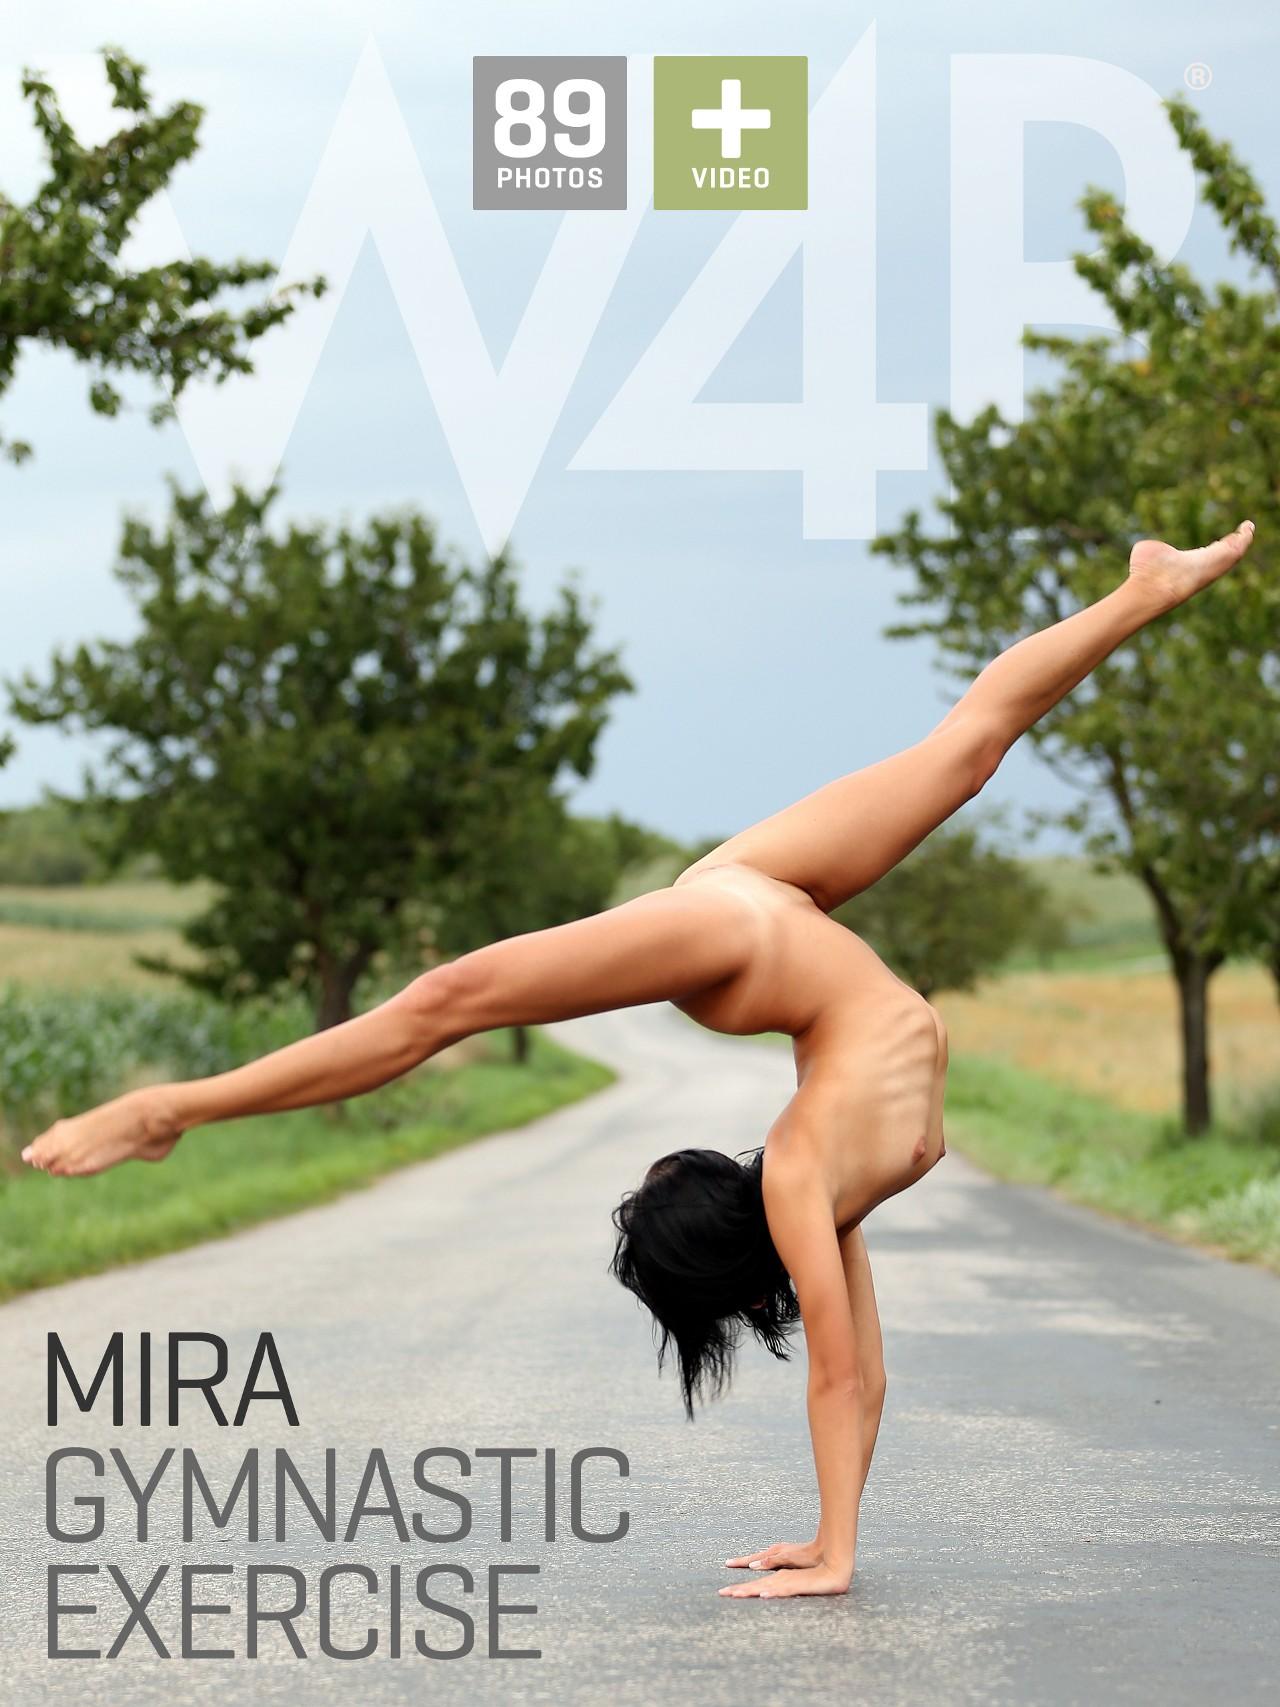 Mira: Gymnastic exercise